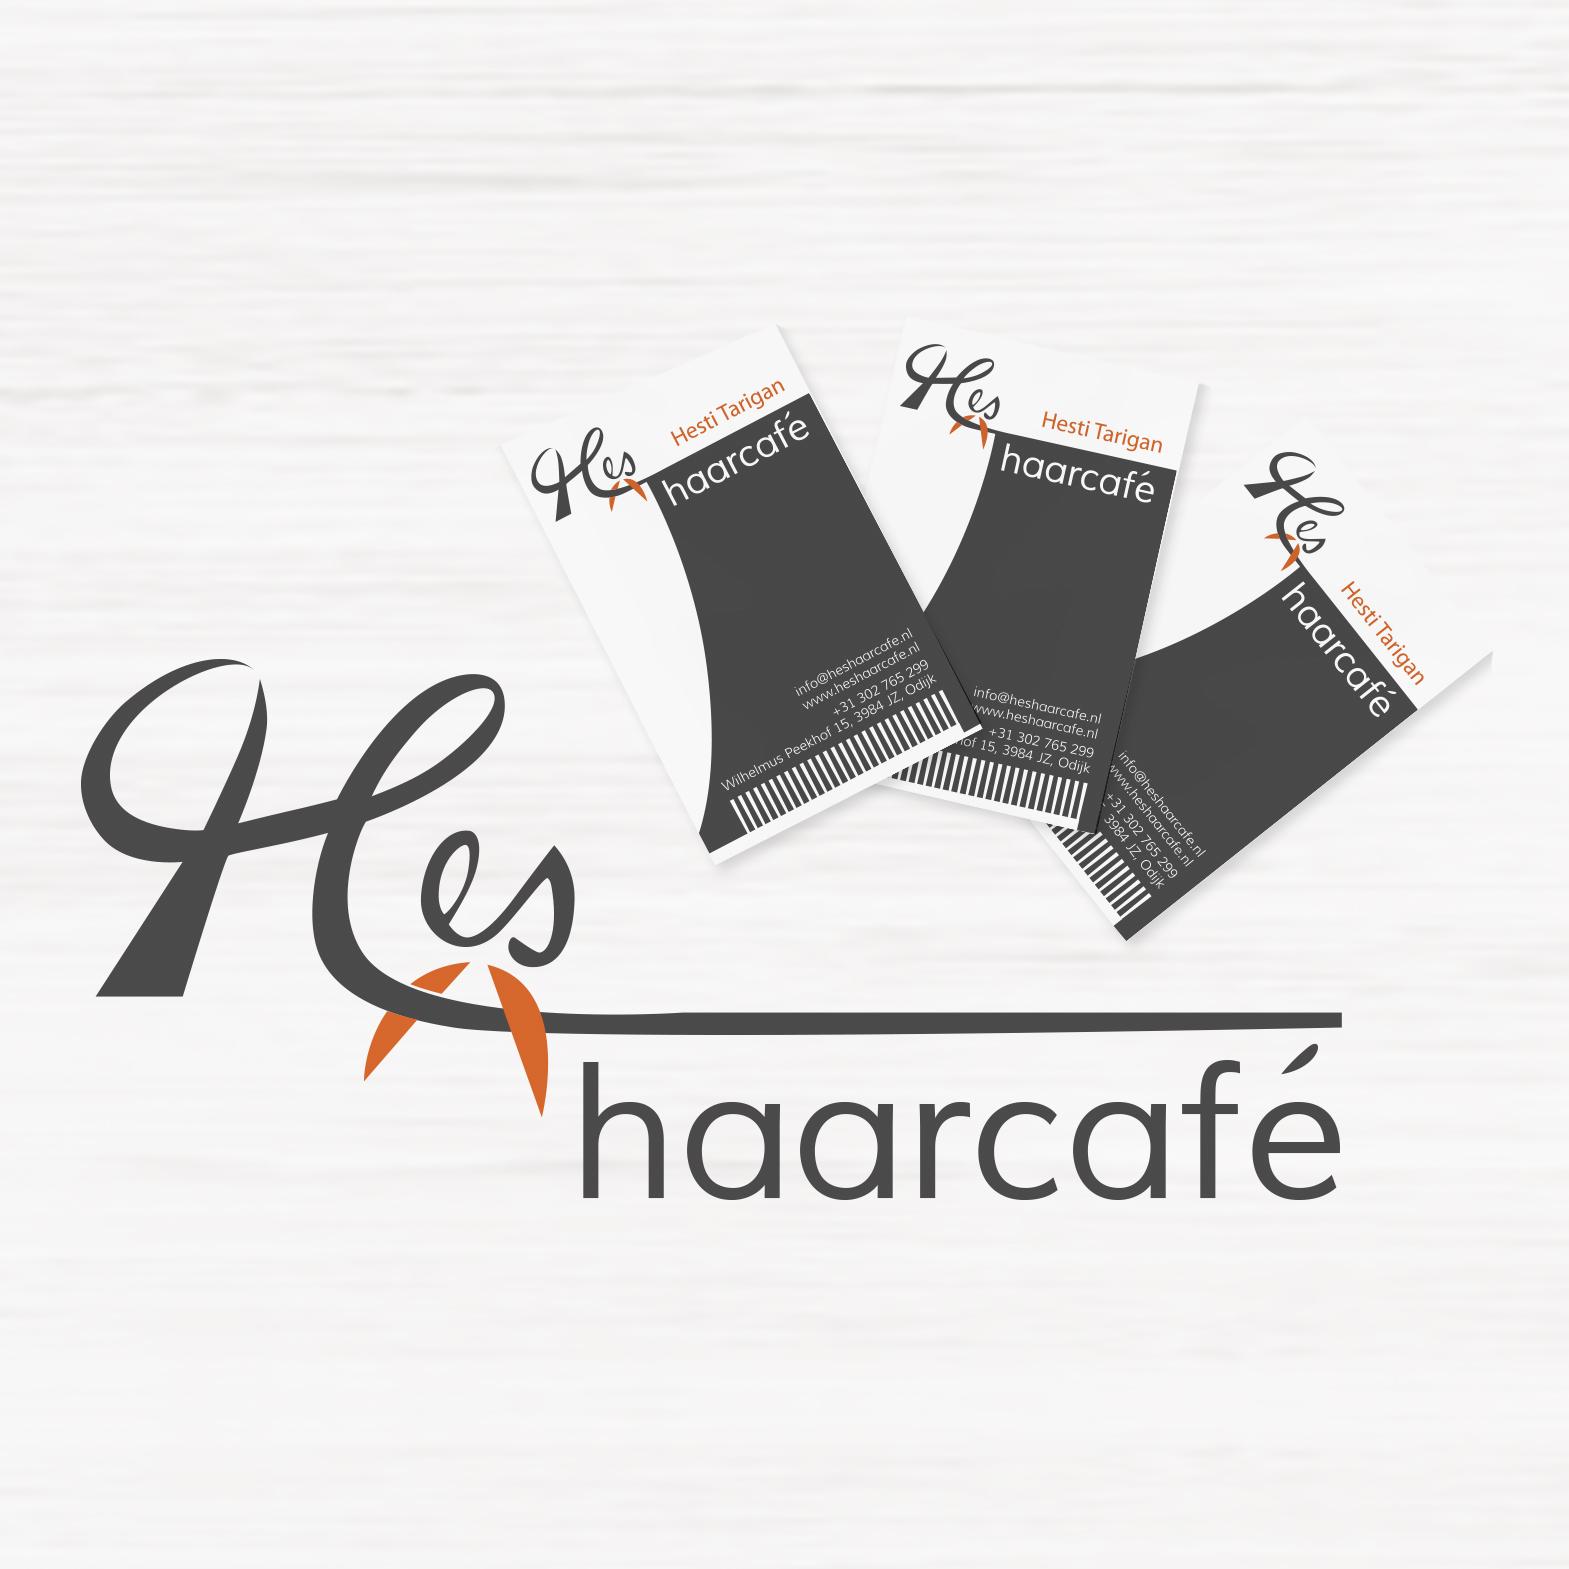 hers-logo